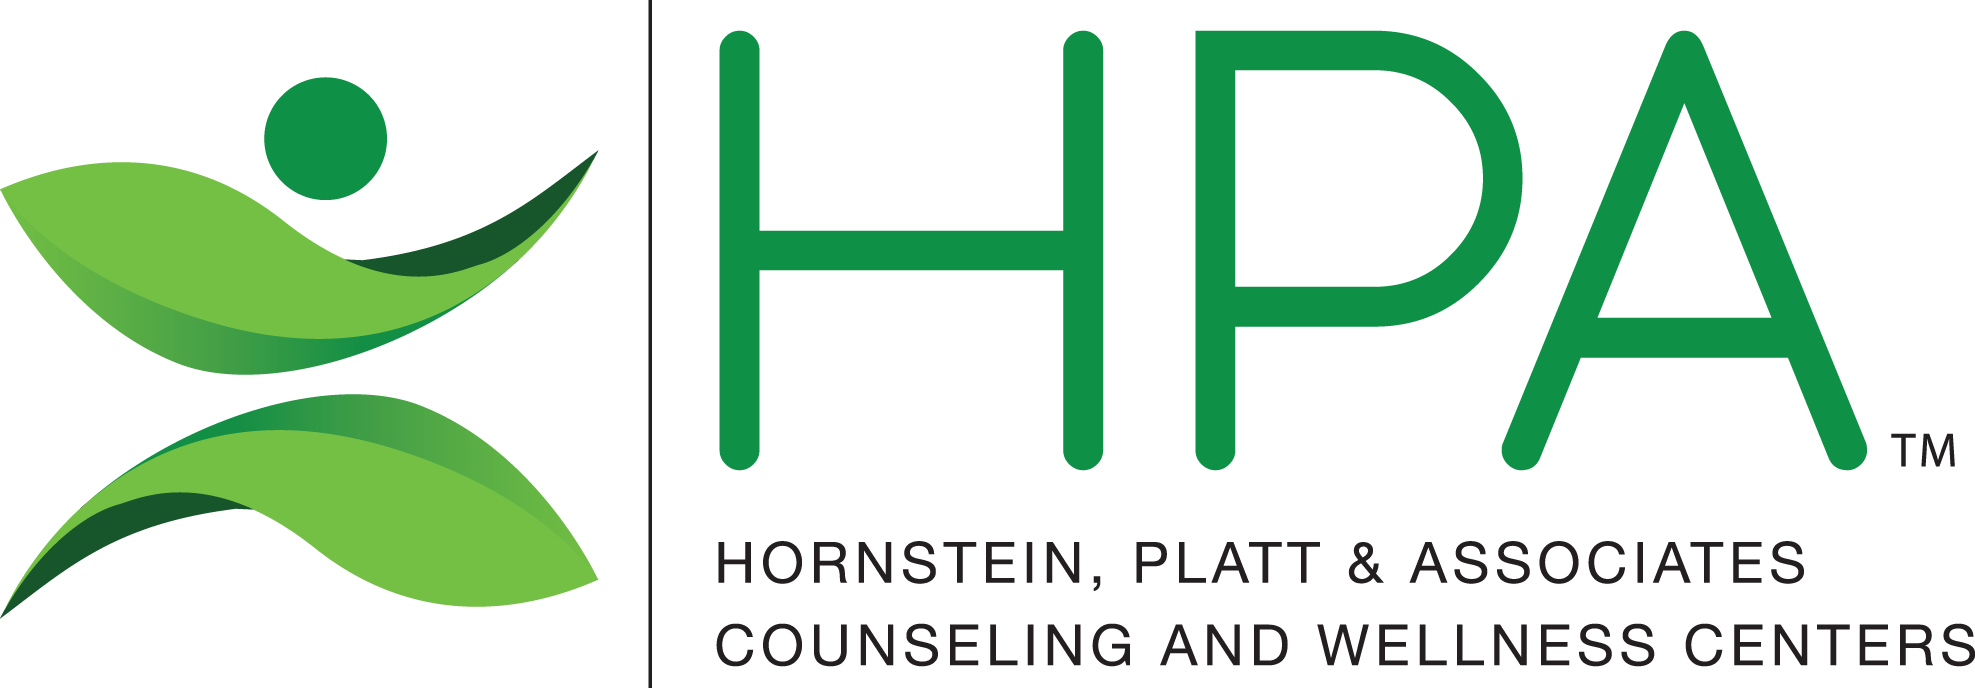 HPA_logo_final